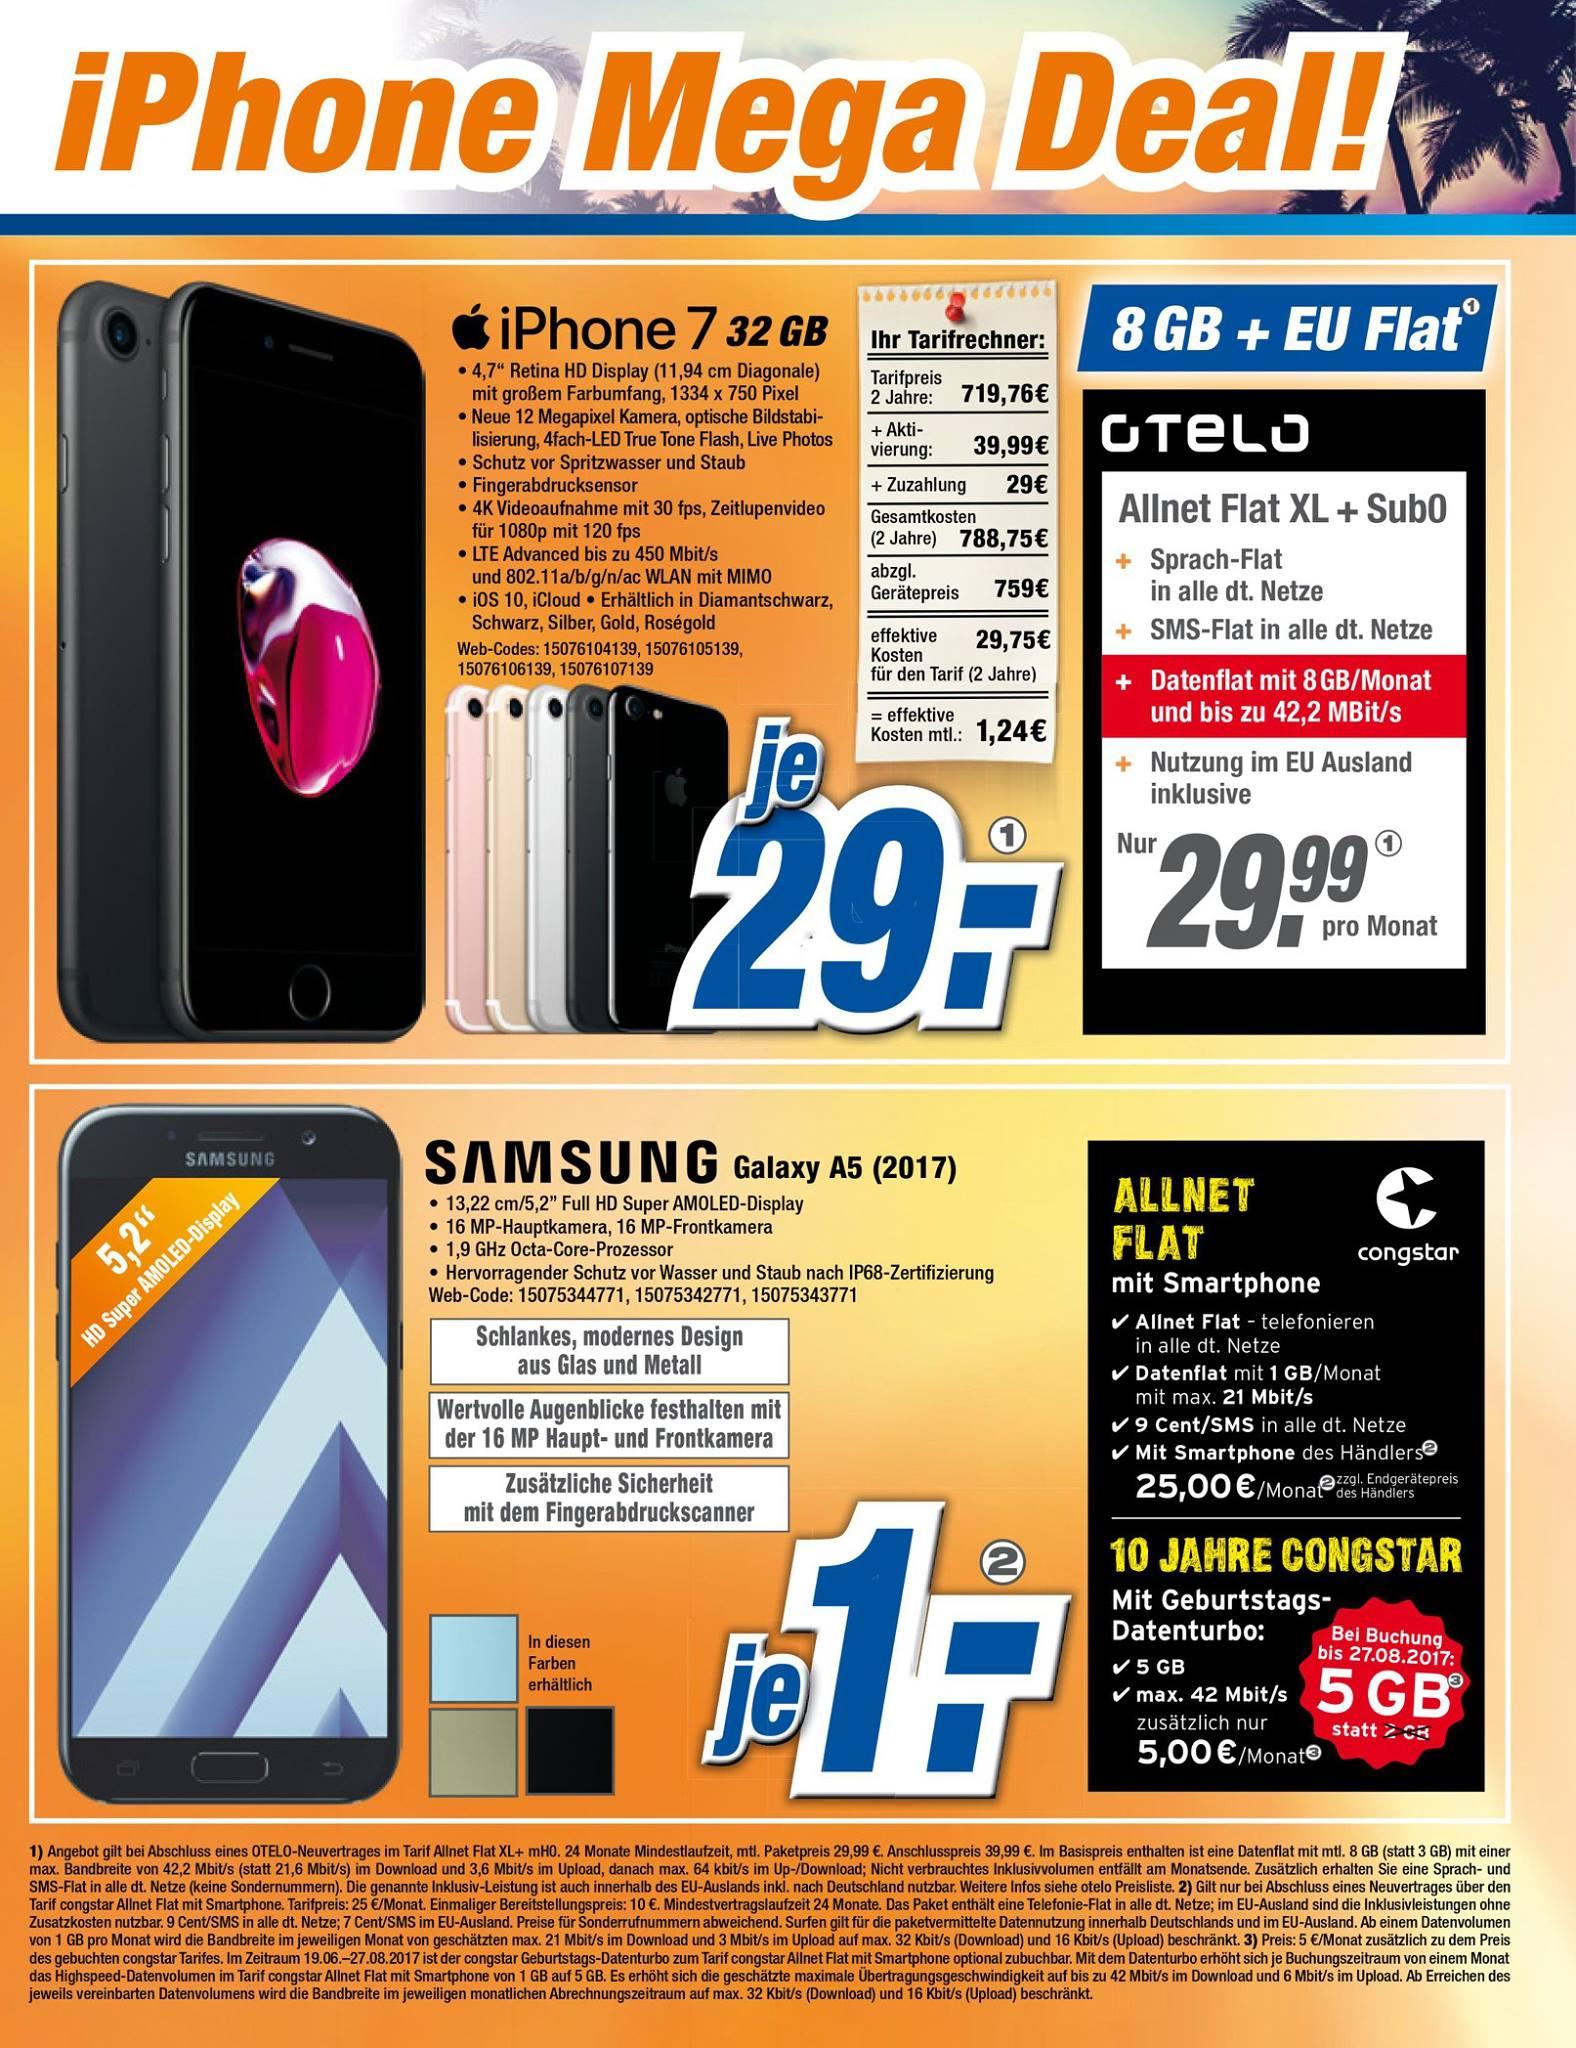 Apple I Phone 7 32GB & OTELO XL+ 8GB für nur 29,99€ Monatlich